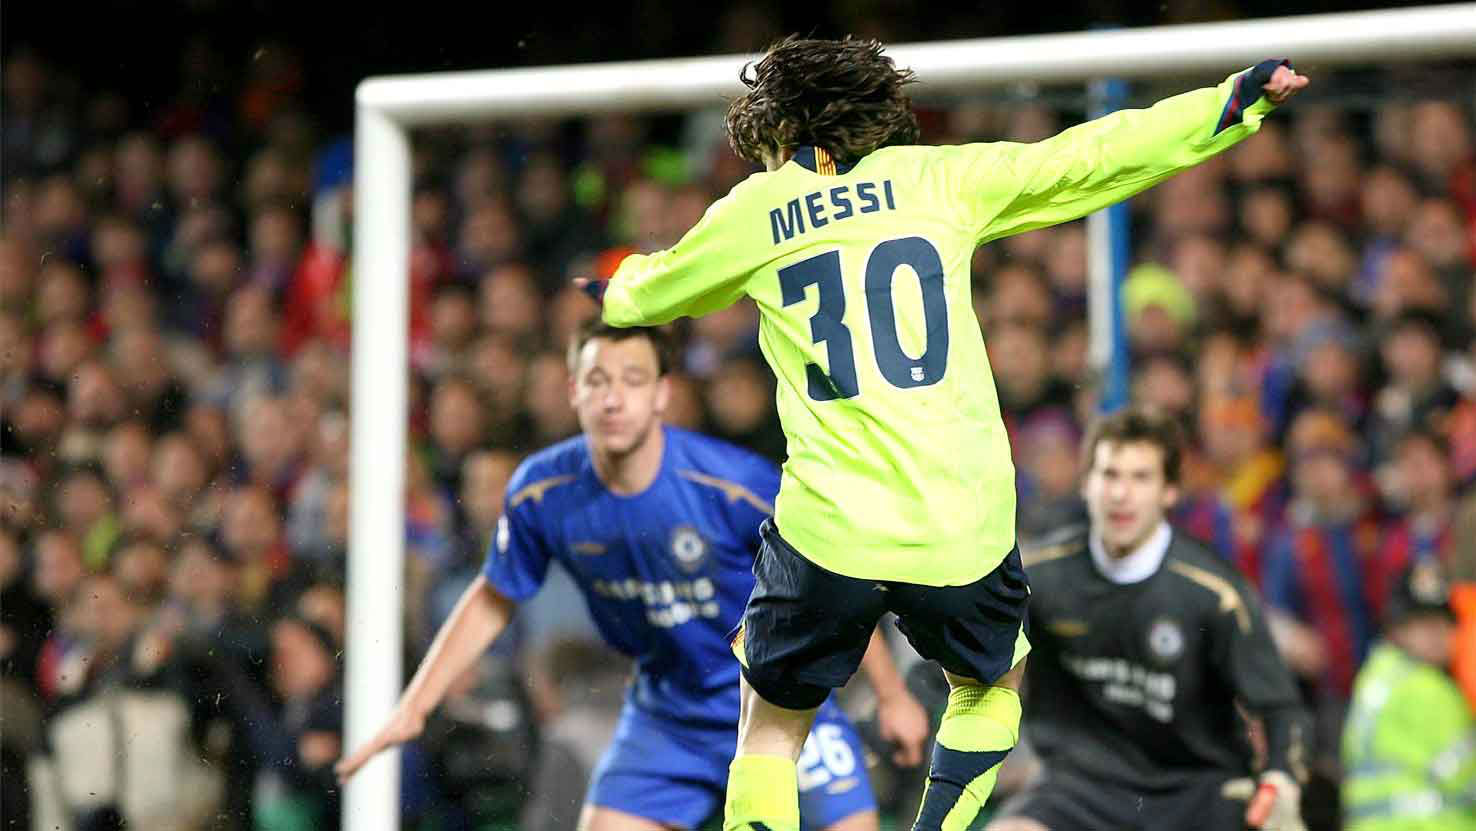 El show de Messi contra el Chelsea en 2006